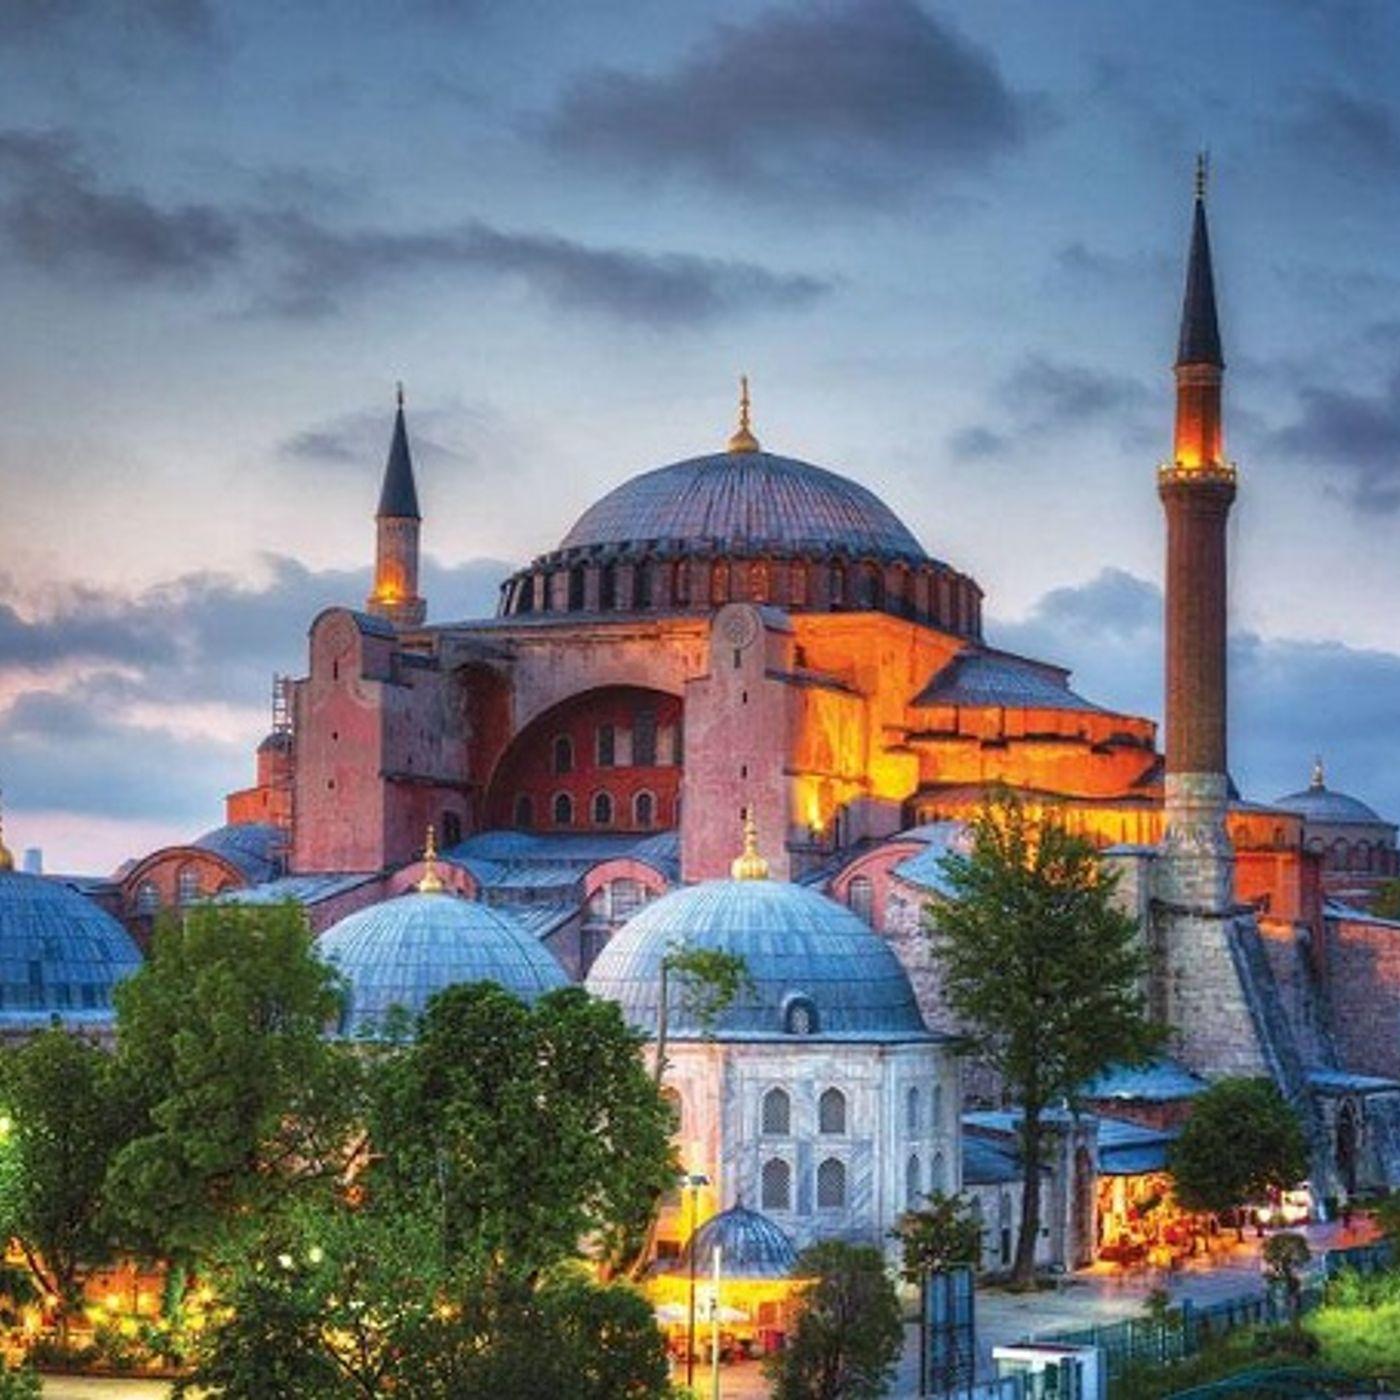 Turkey turns Hagia Sophia into mosque Image